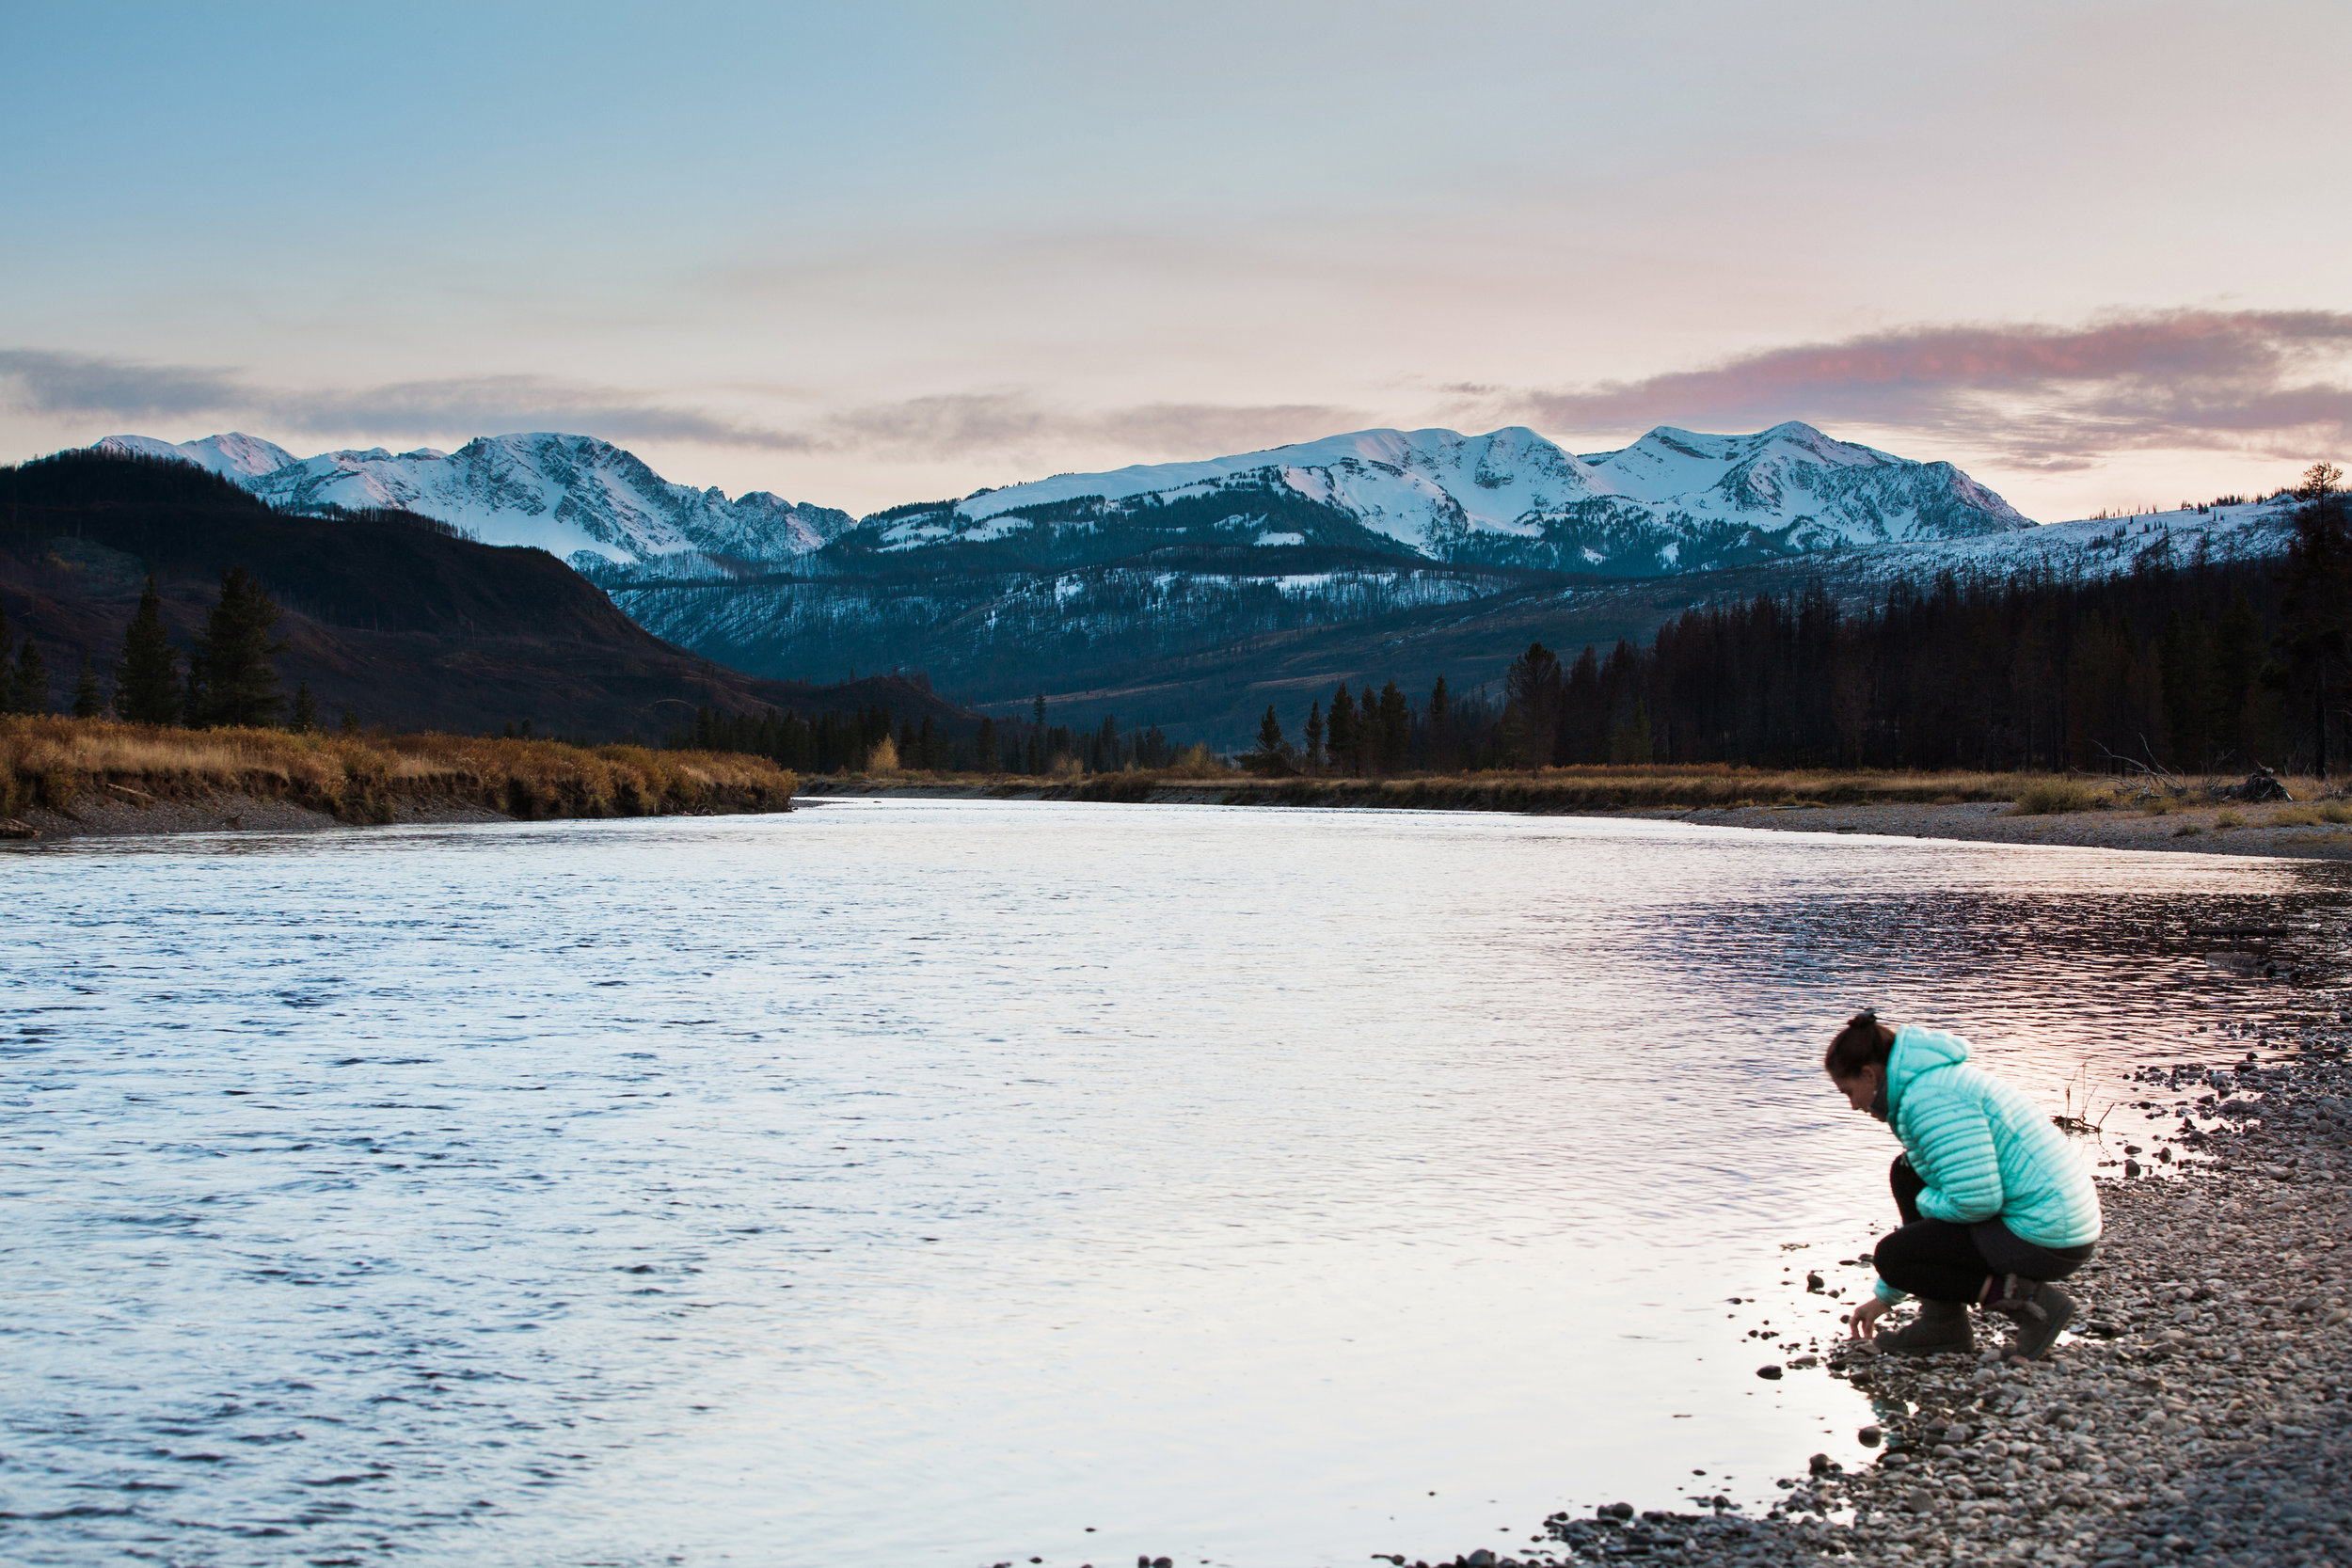 CindyGiovagnoli_Yellowstone_Grand_Teton_National_Park_Wyoming_mountains_deer_sunset_fall_autumn_October_alpenglow-009.jpg